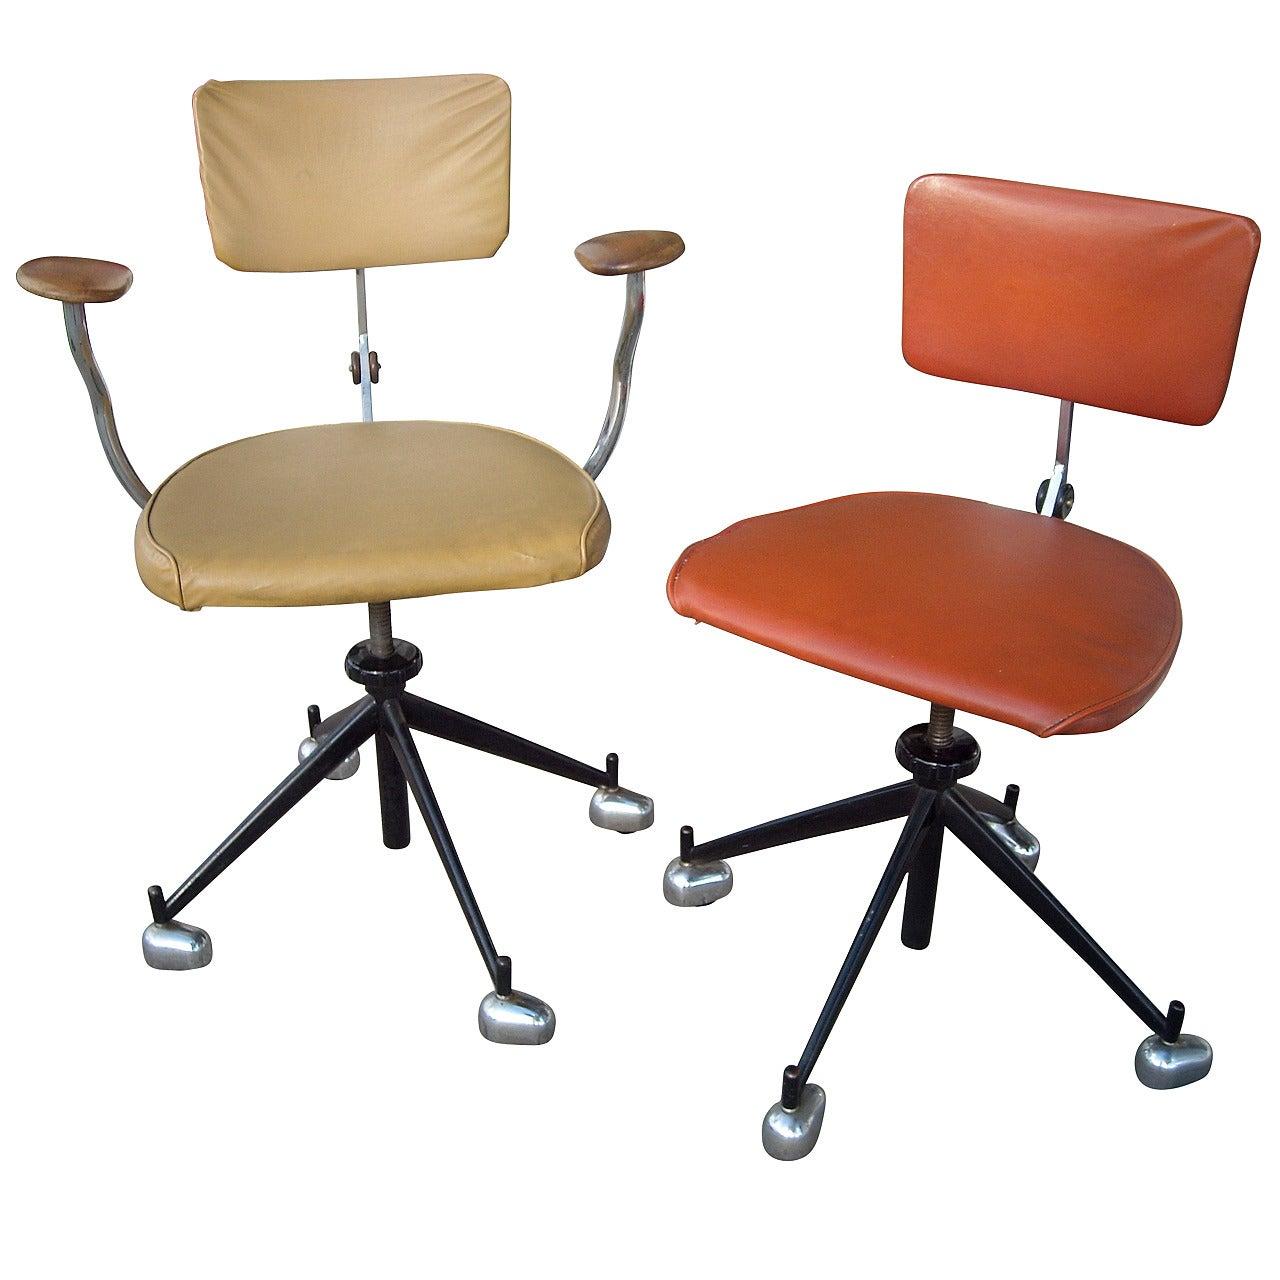 ebb90921b7b0 Industrial Steel Burroughs Adjustable Posture Office Chair